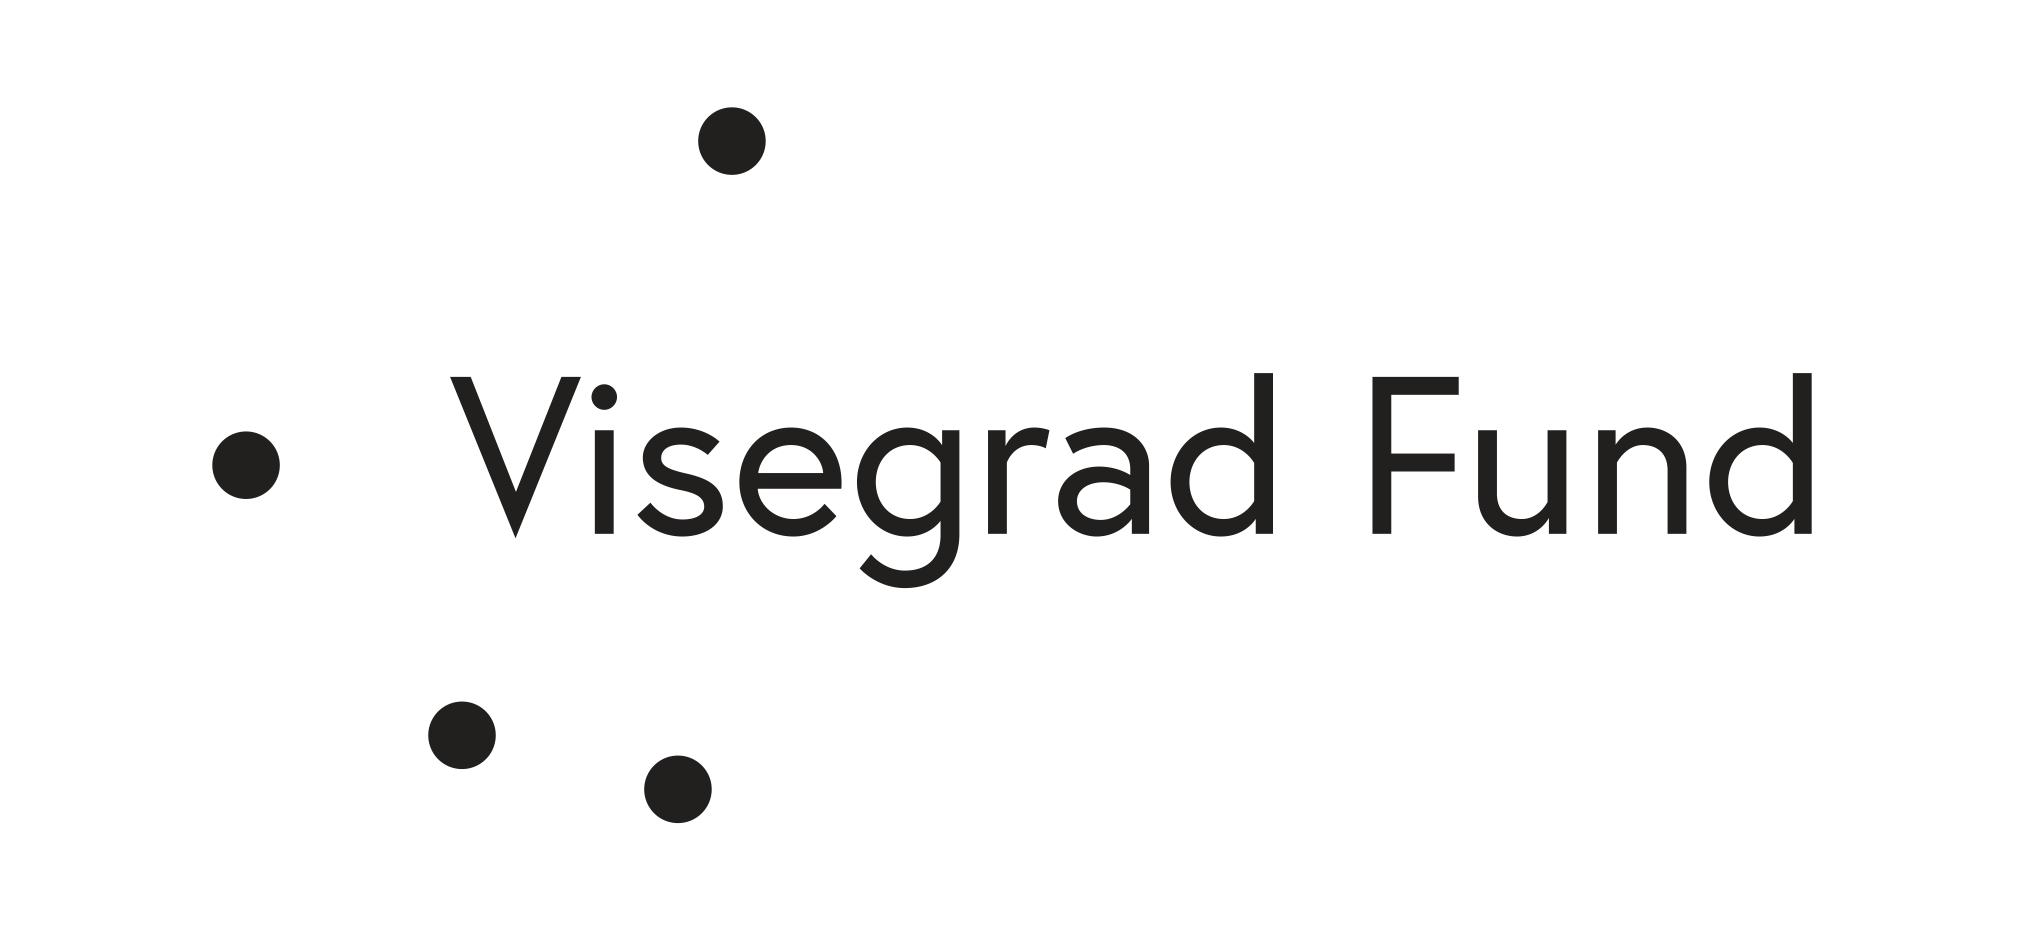 visegrad_fund_logo_black_page-0001.jpg